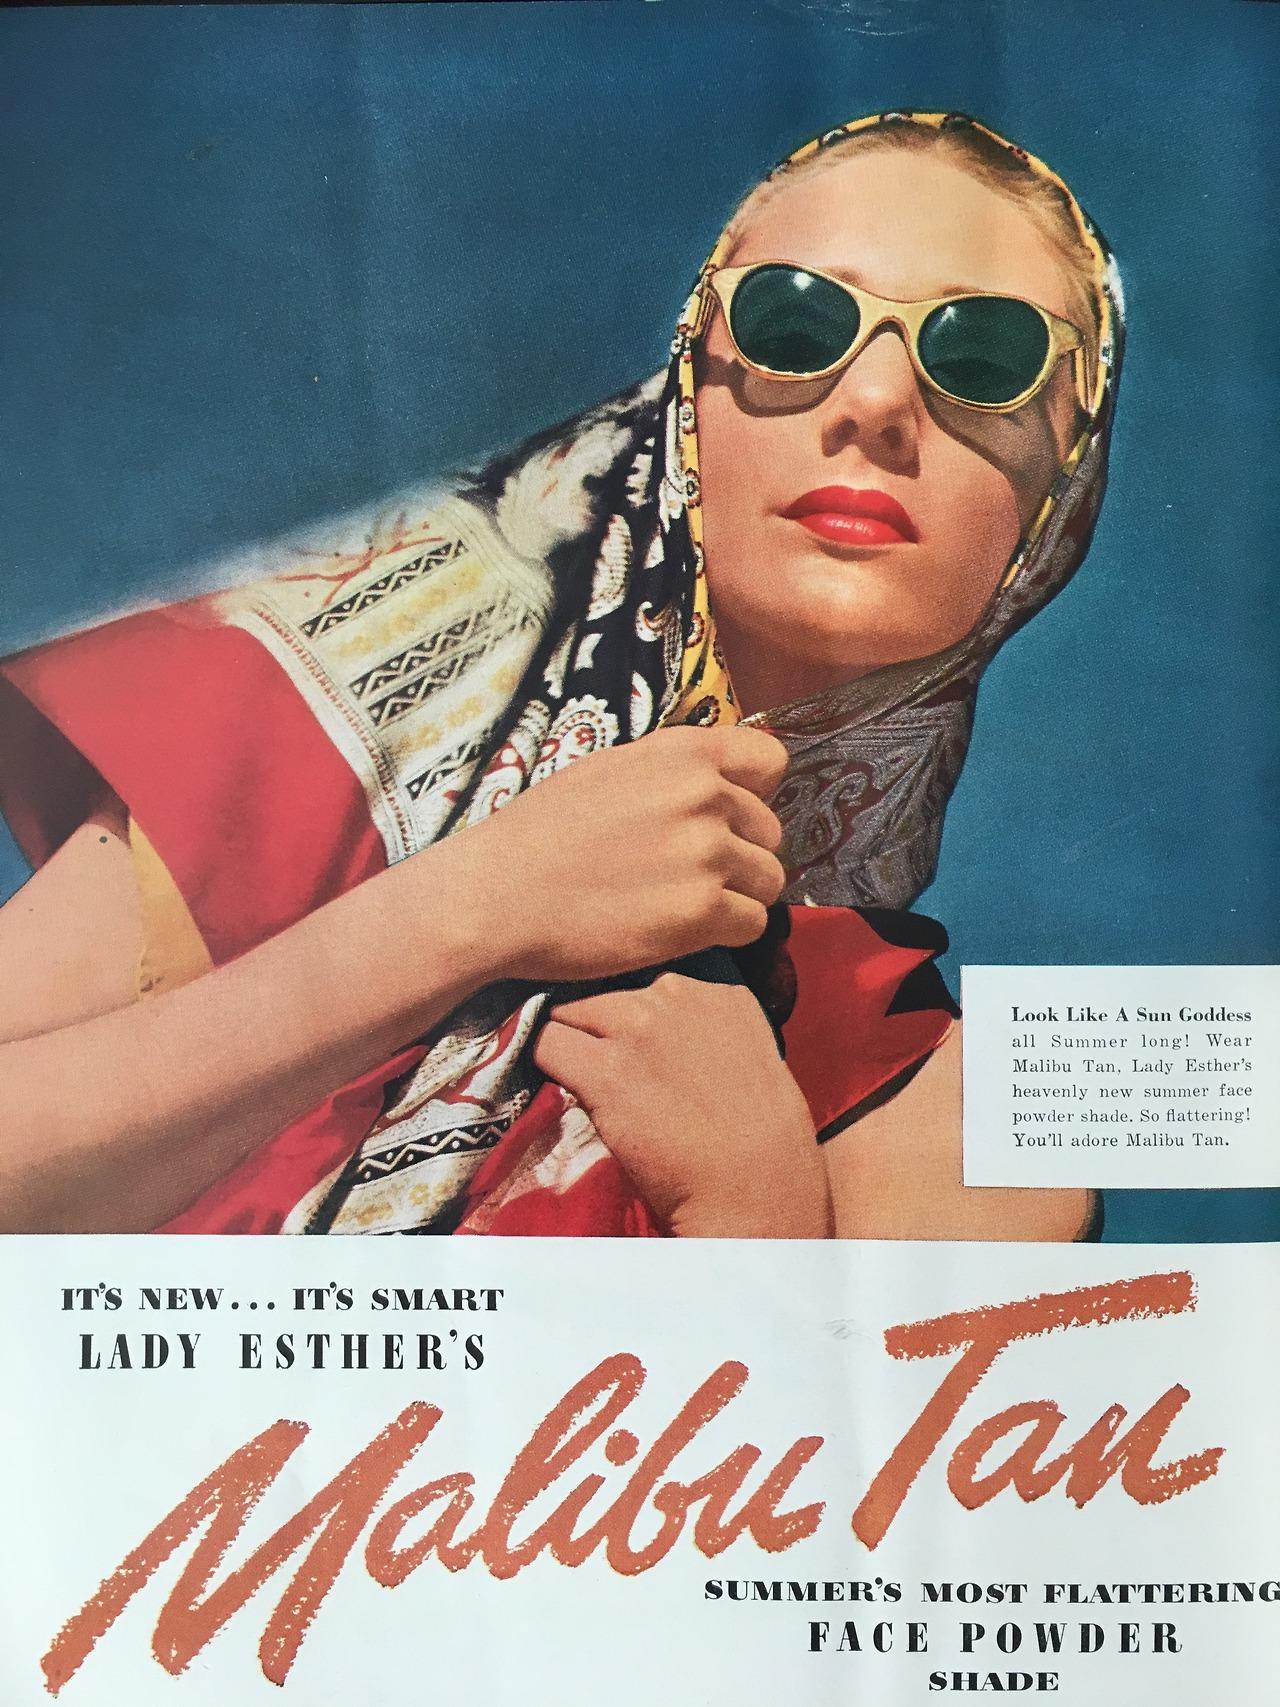 Lady Esther's Malibu Tan Face Powder.  Mademoiselle. July 1947.